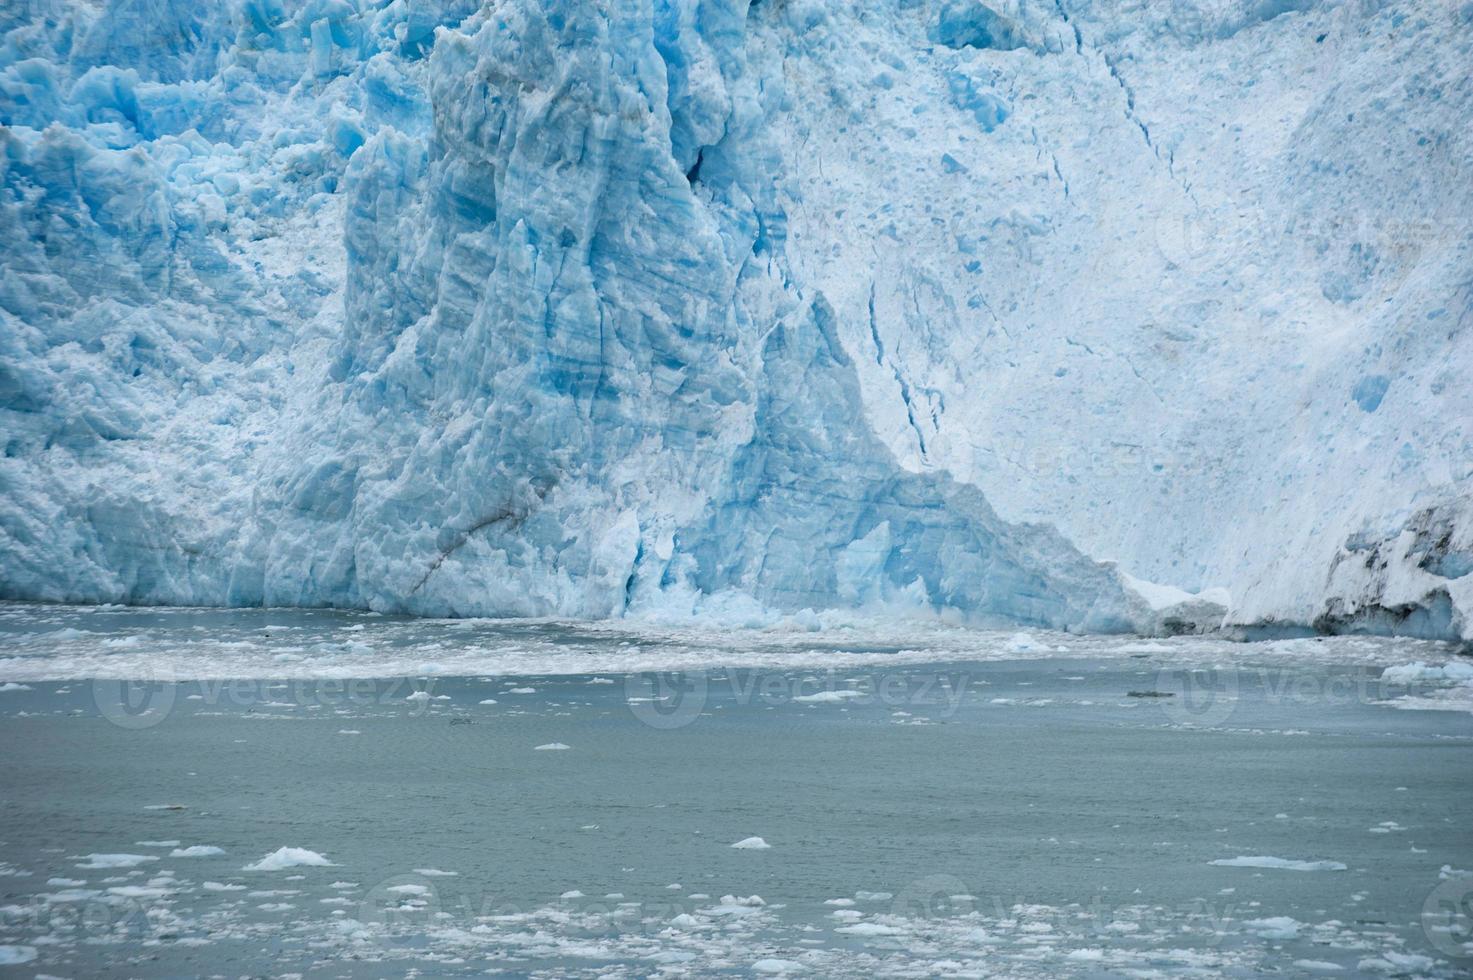 The Hubbard Glacier while melting, Alaska photo